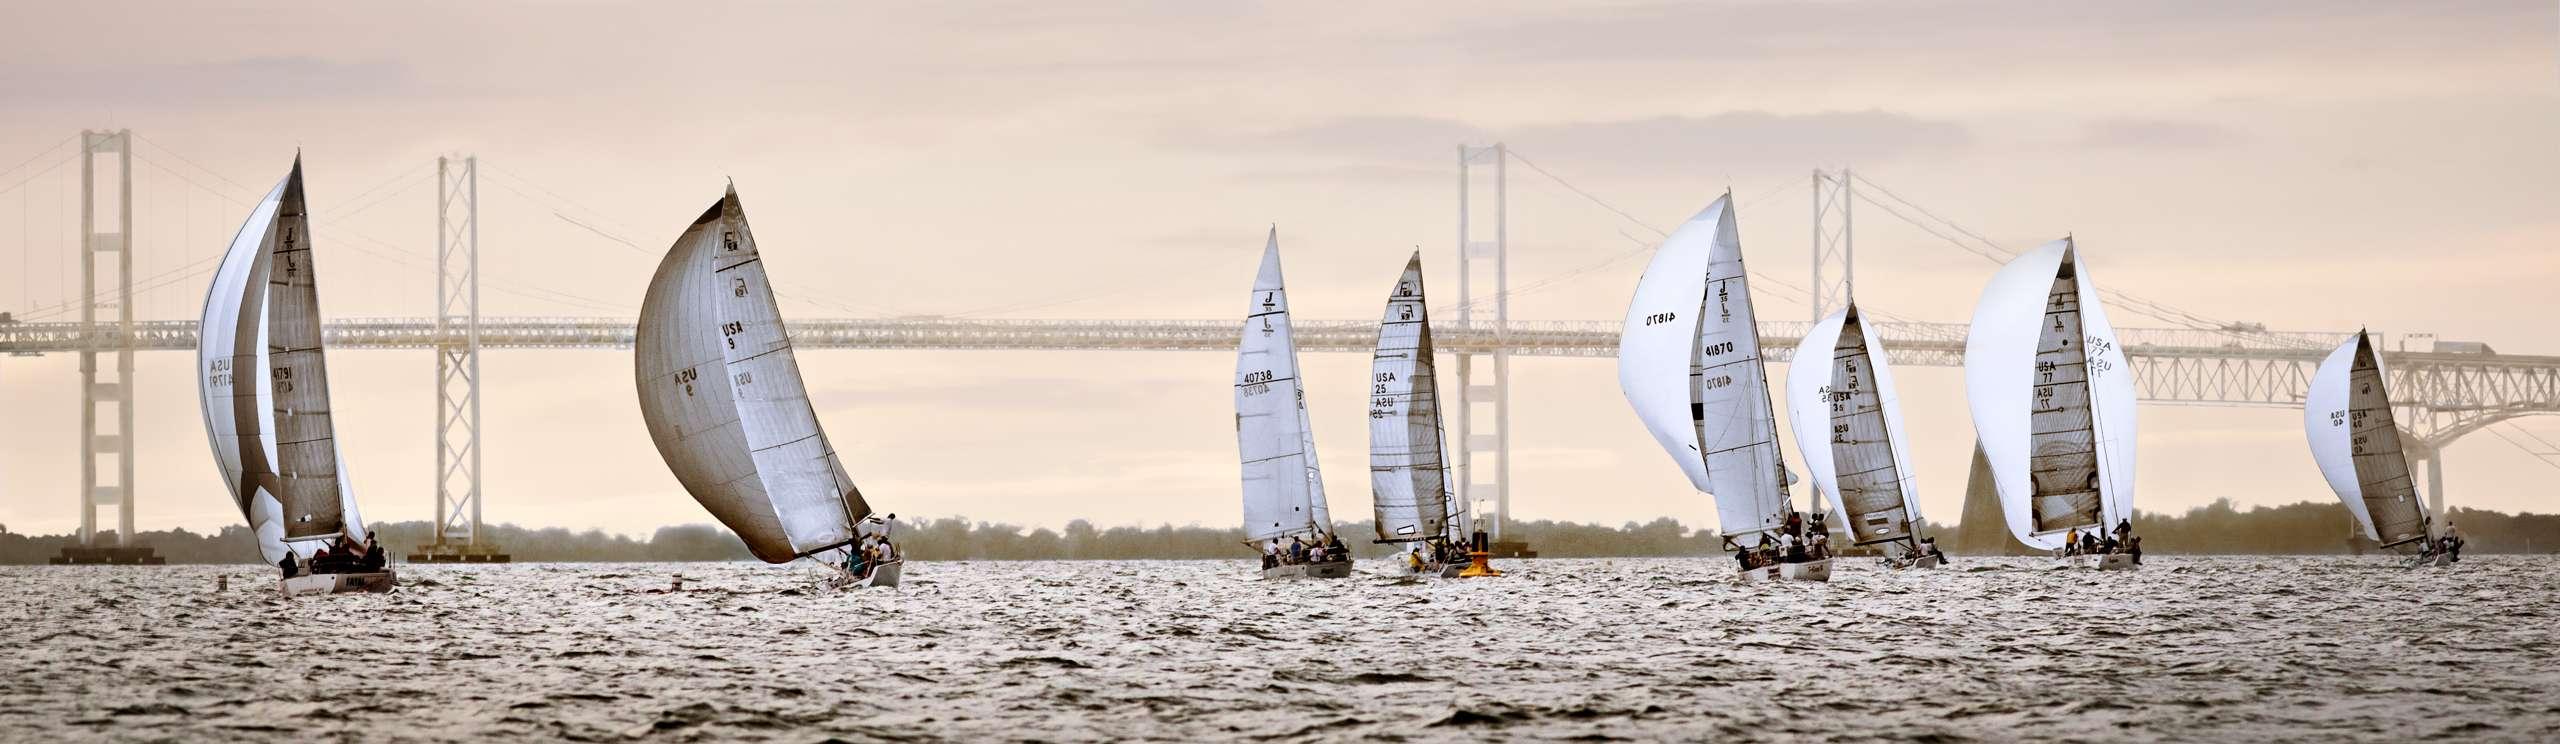 PORTFOLIO - Sailing - Chesapeake #8    PCG754